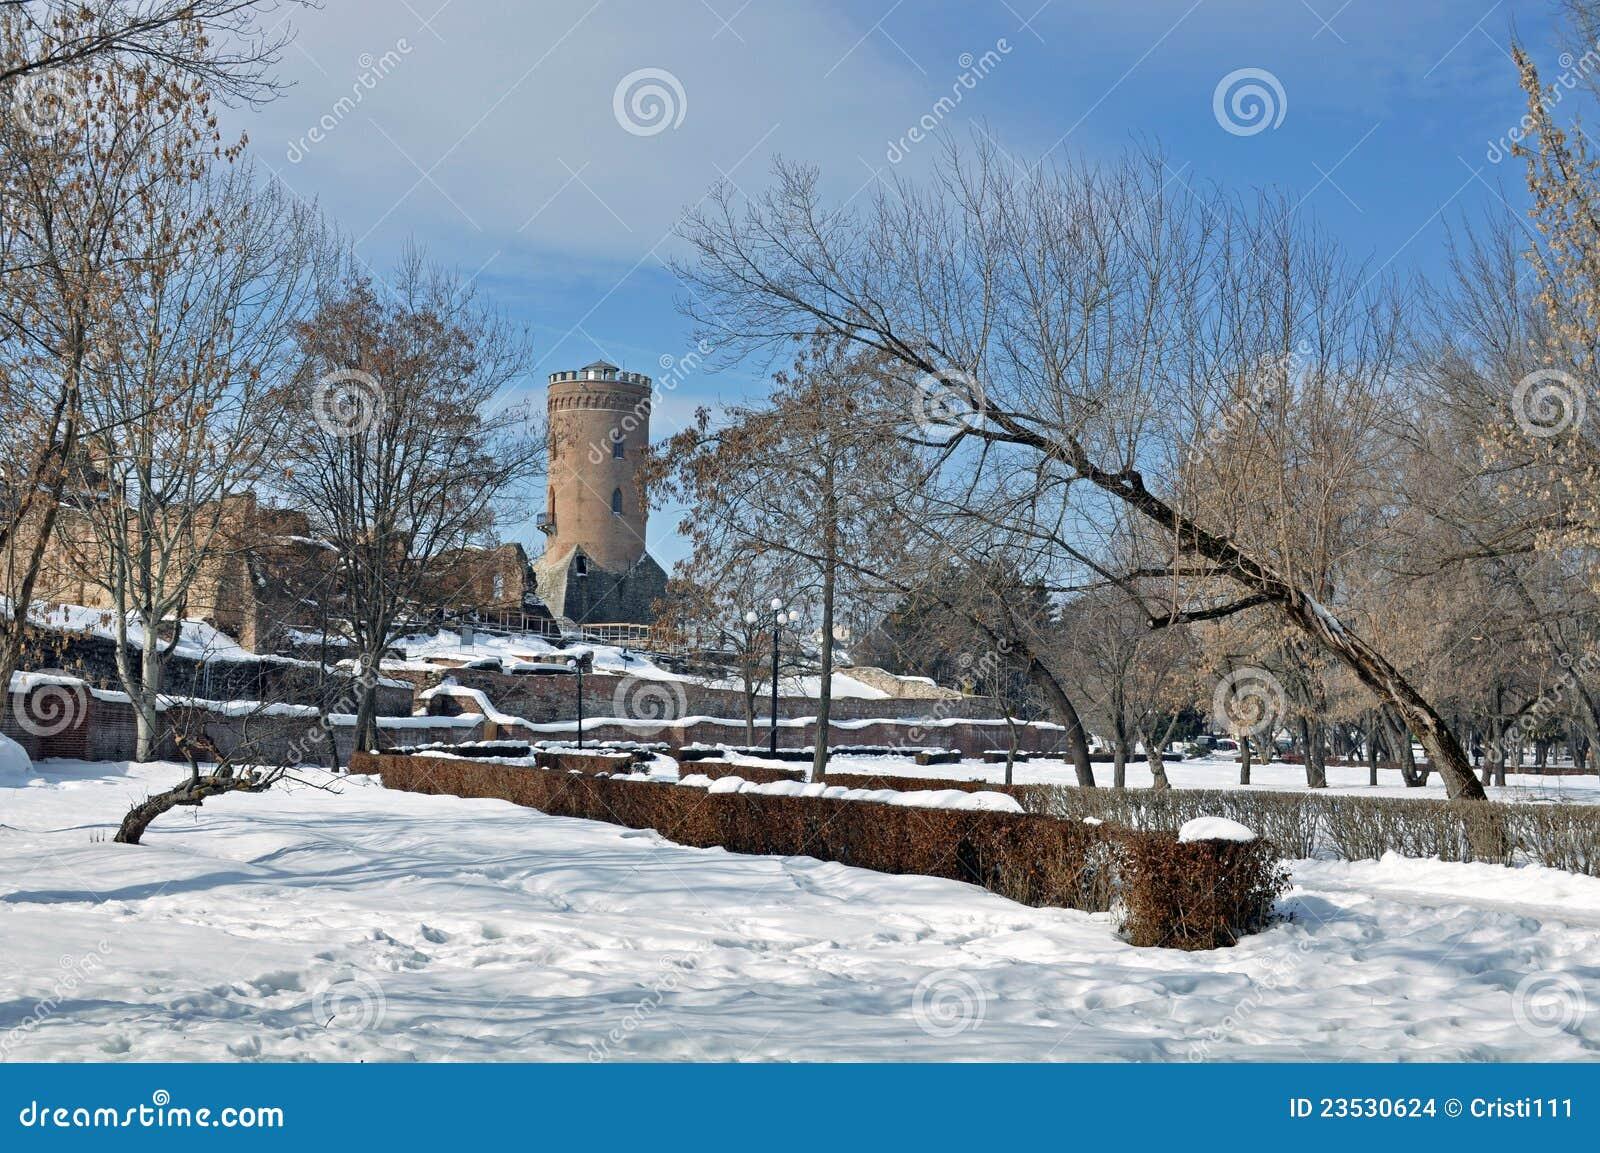 Chindia Tower In Targoviste, Romania Stock Photo - Image ...  |Chindia